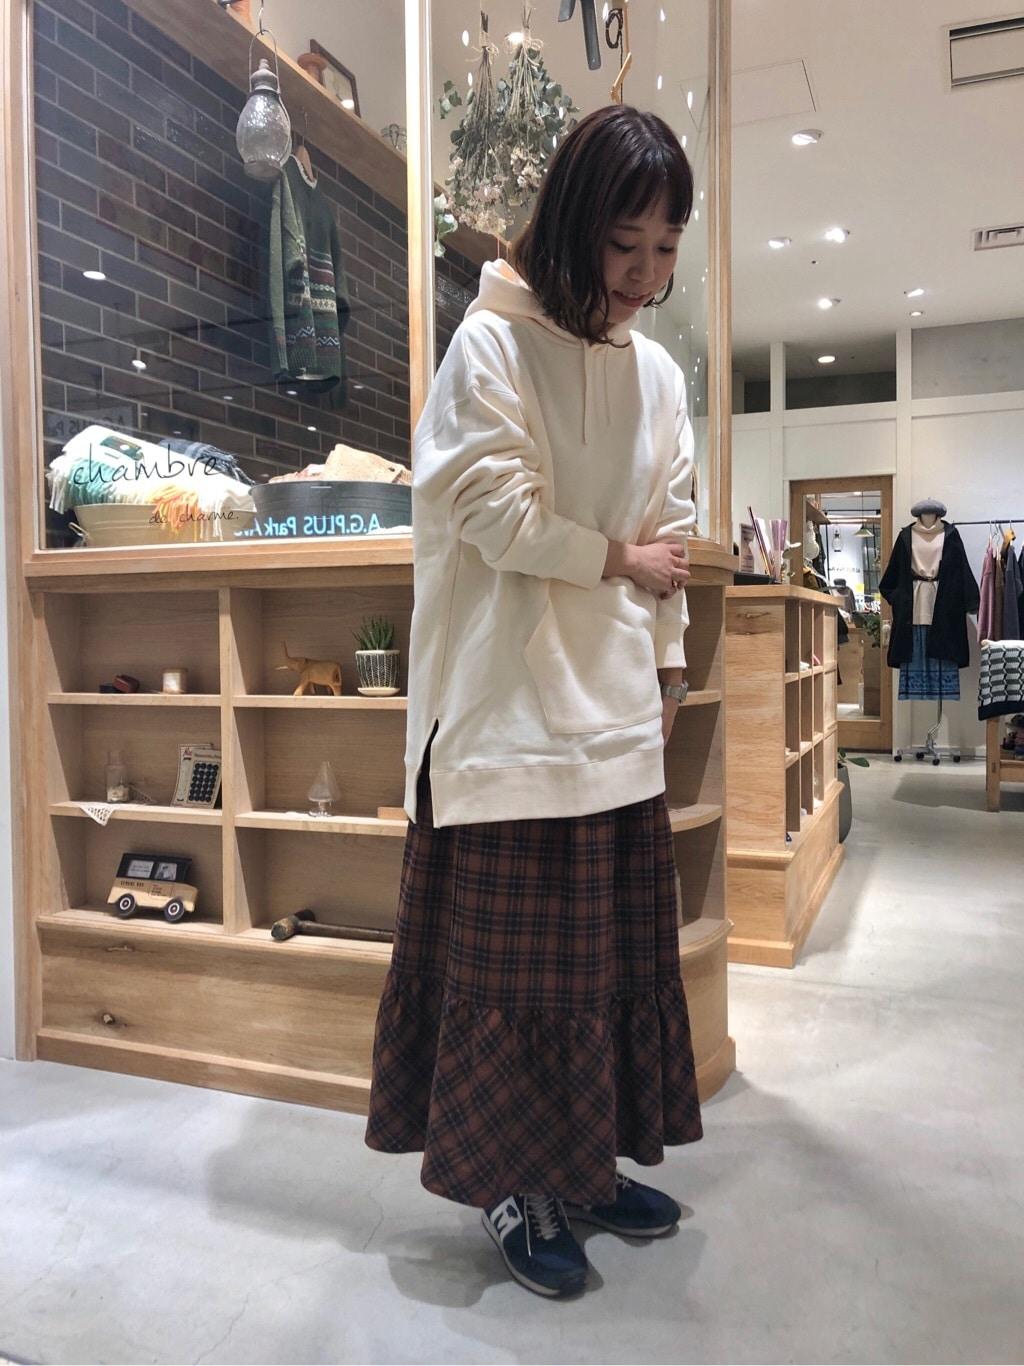 chambre de charme キラリナ京王吉祥寺 身長:157cm 2019.12.06